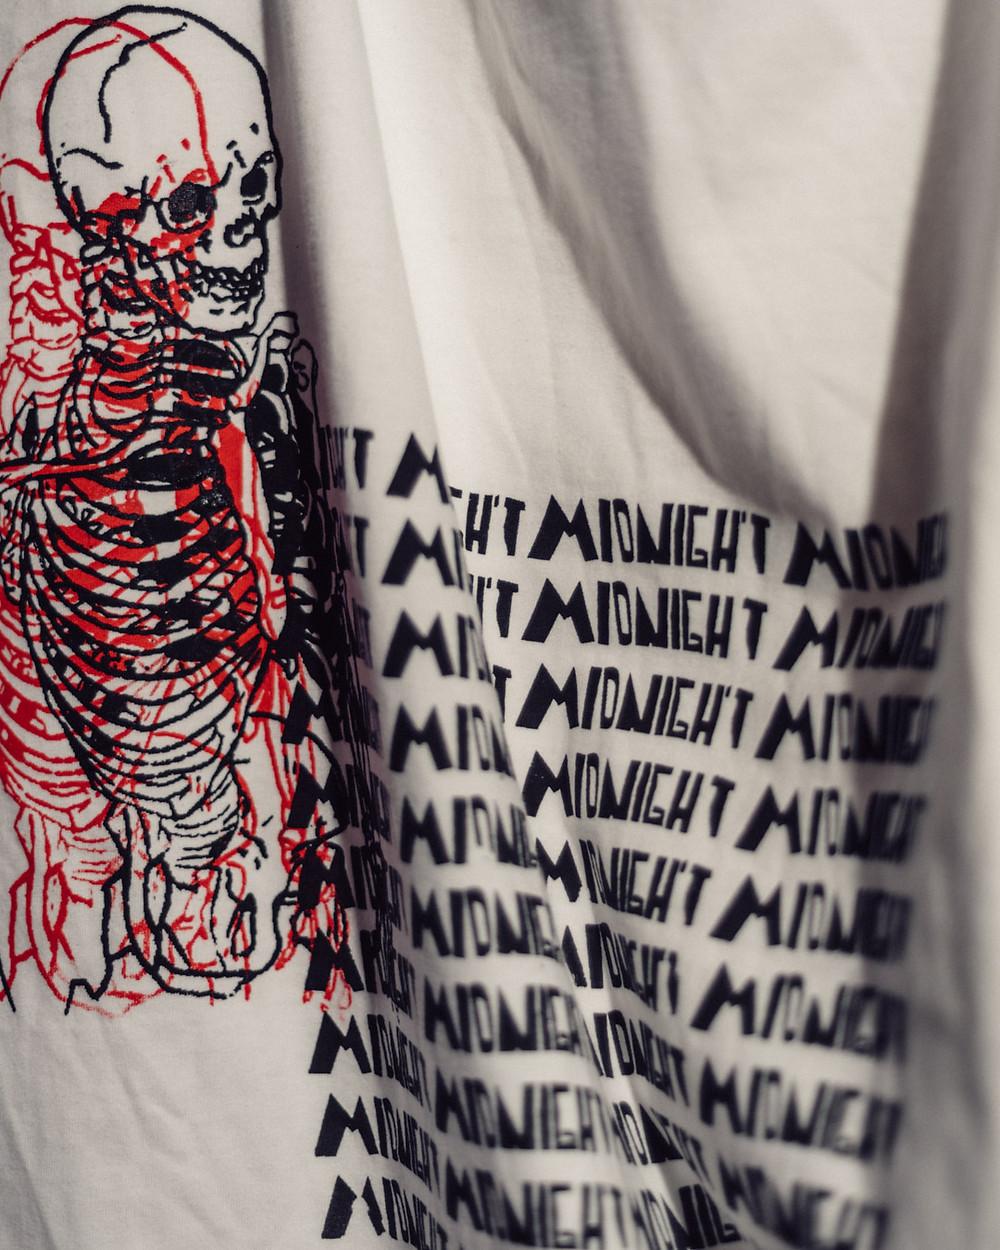 midnight dna shirt